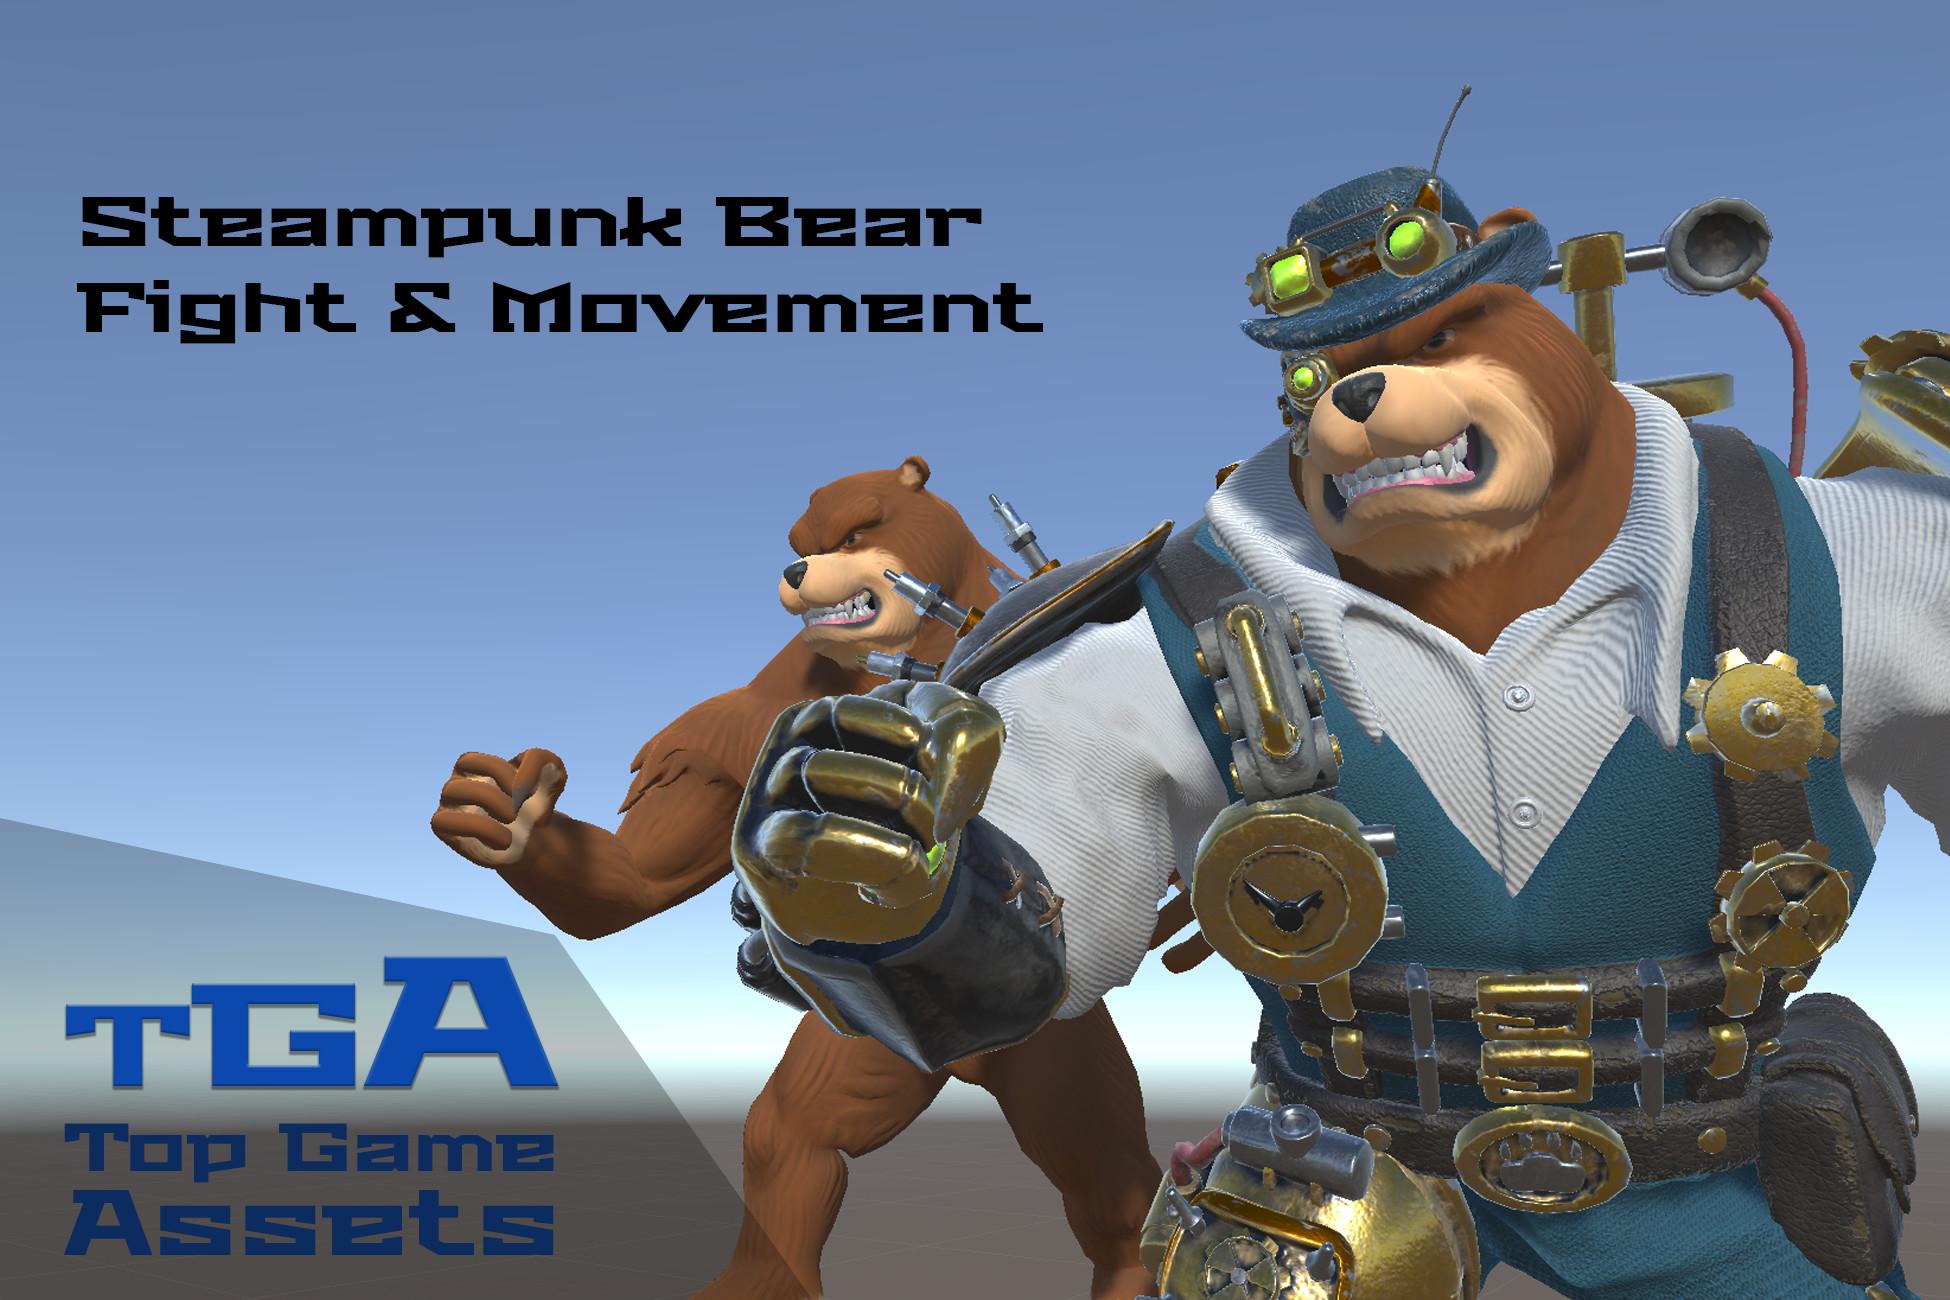 [RPG Animset] Steampunk Bear - Fight & Movement